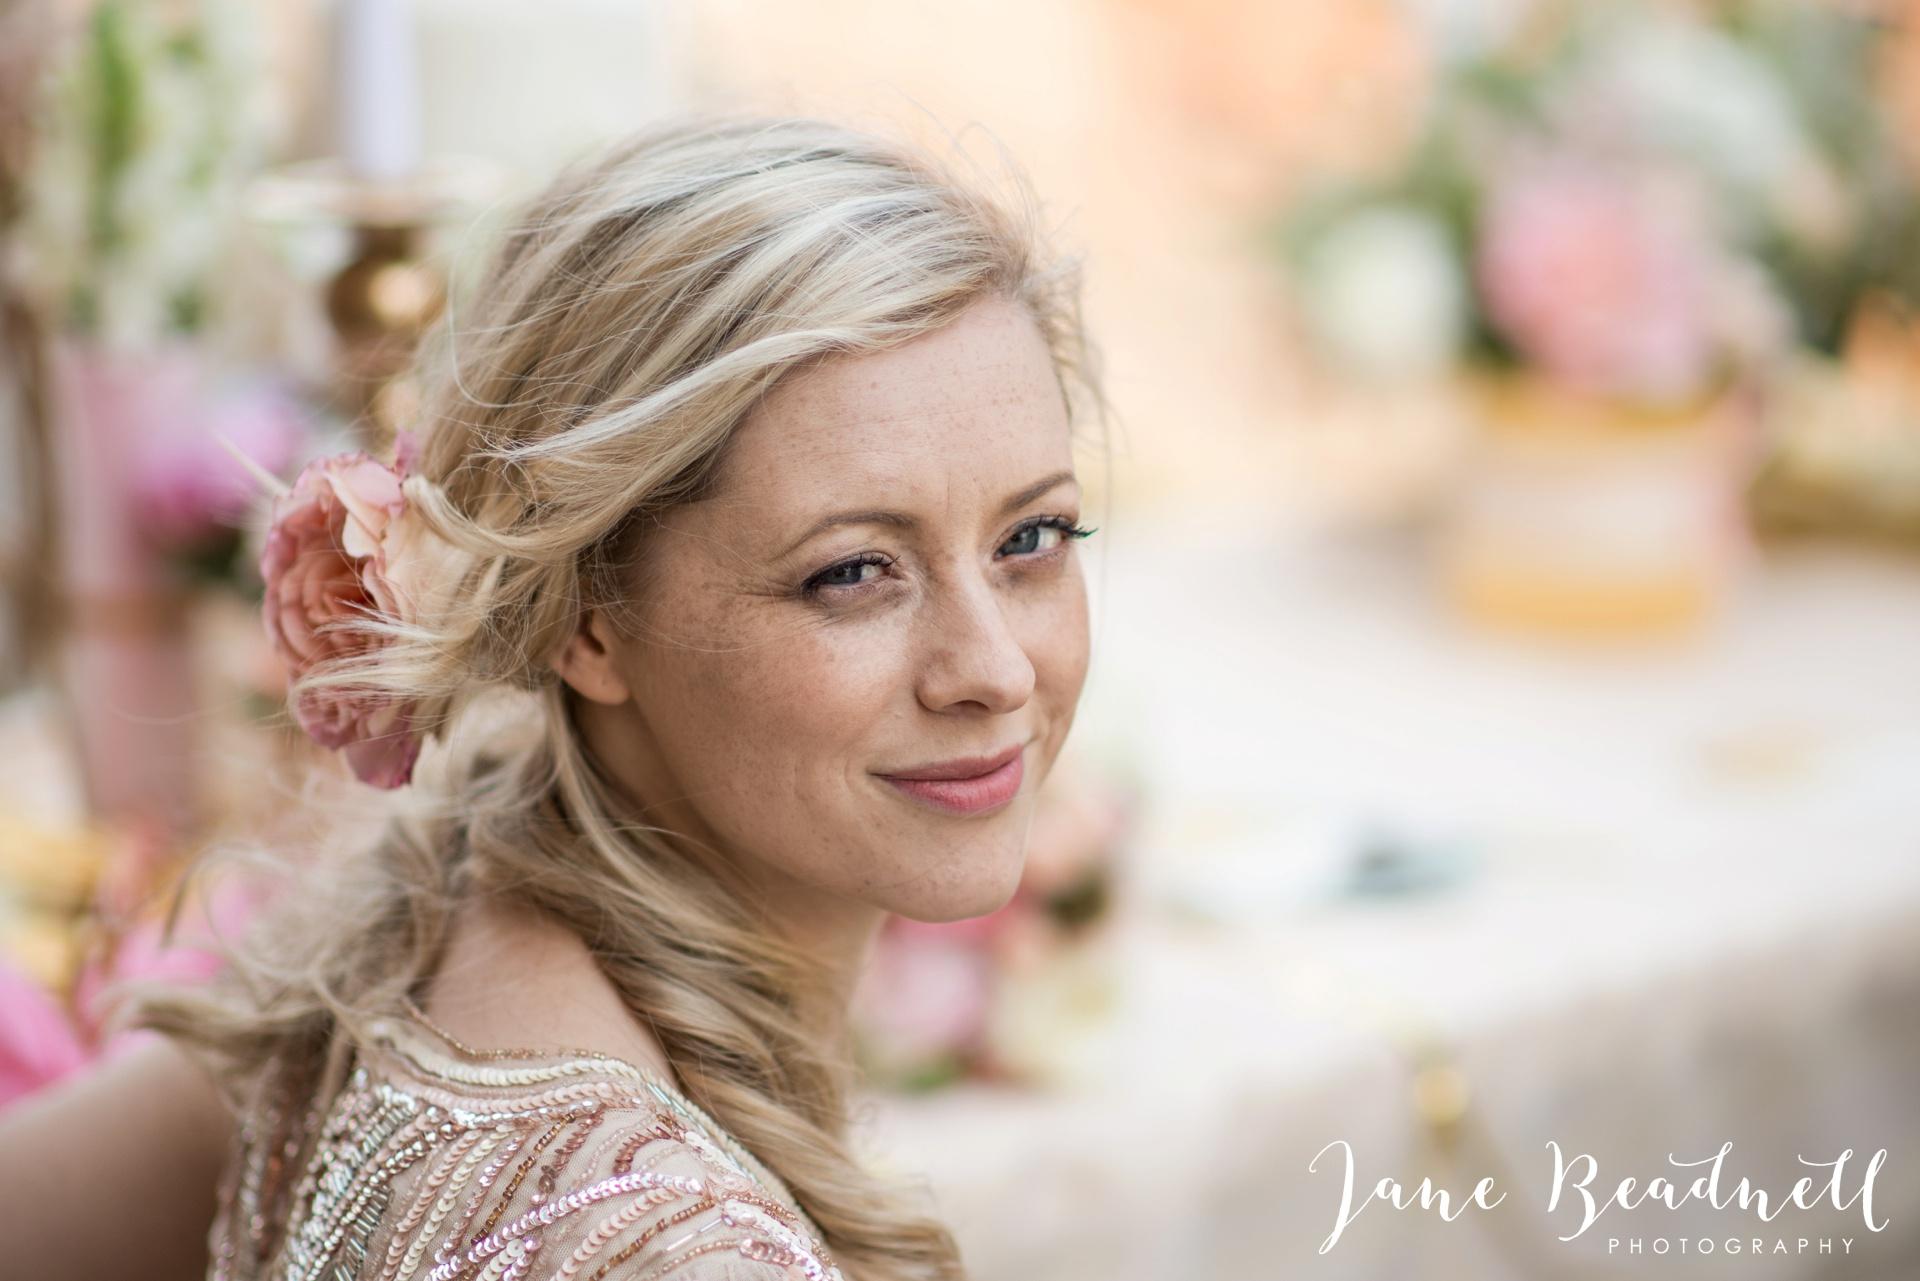 Jane Beadnell fine art wedding photographer York Bridal Photo Shoot_0016